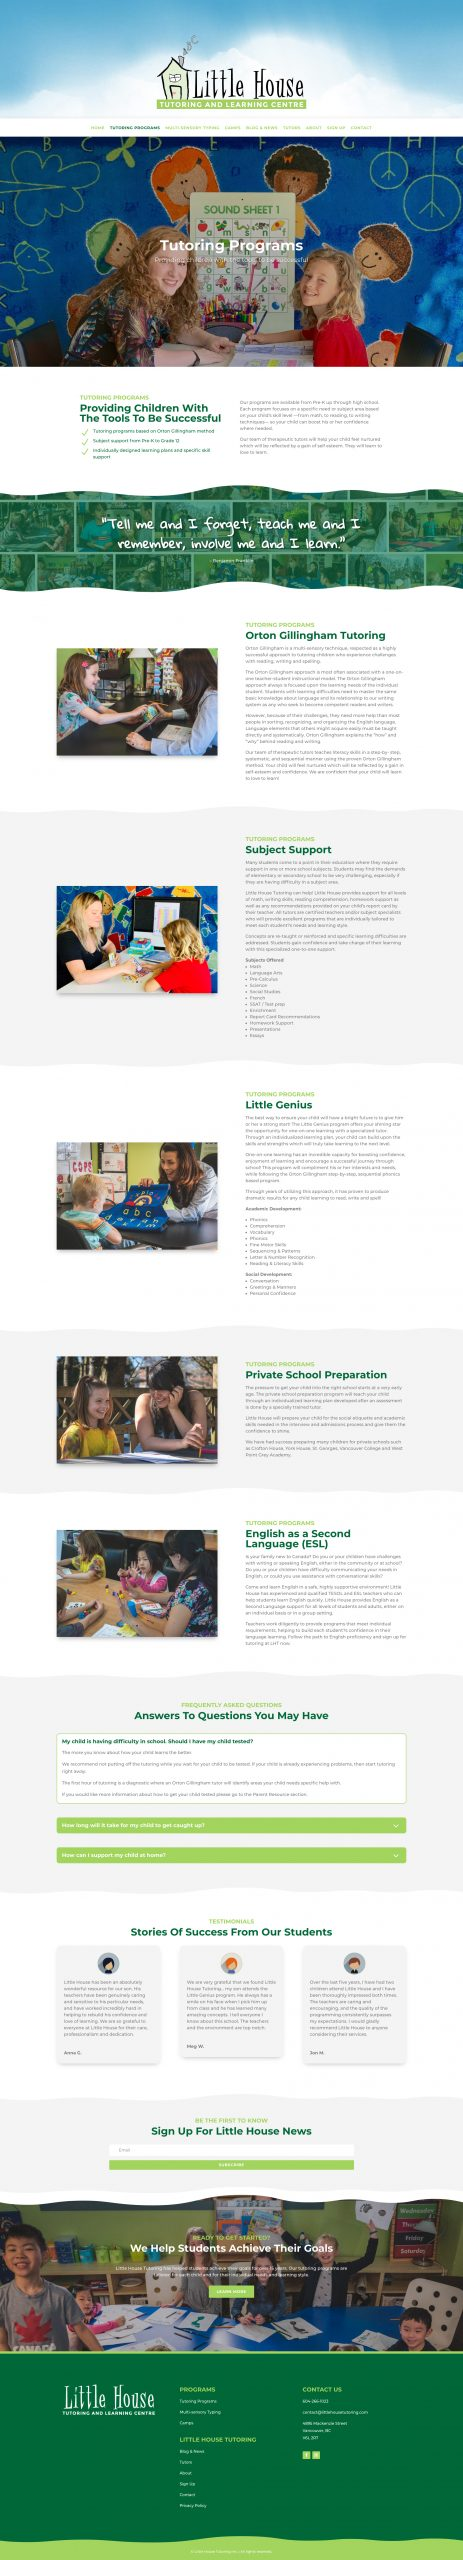 little house tutoring web design